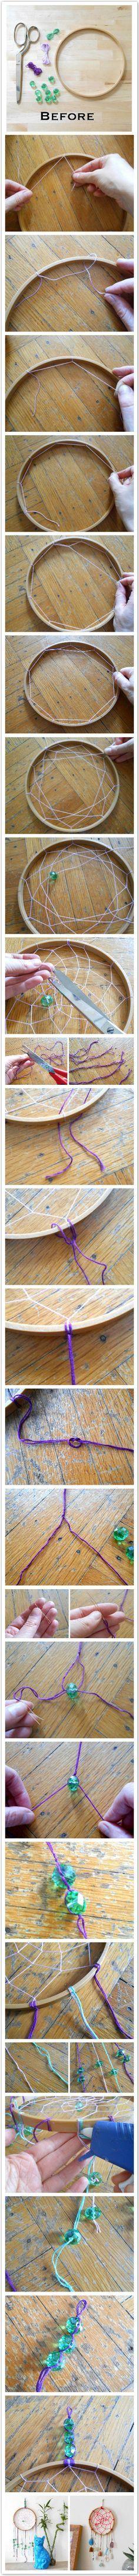 Embroidery Hoop Dream Catcher